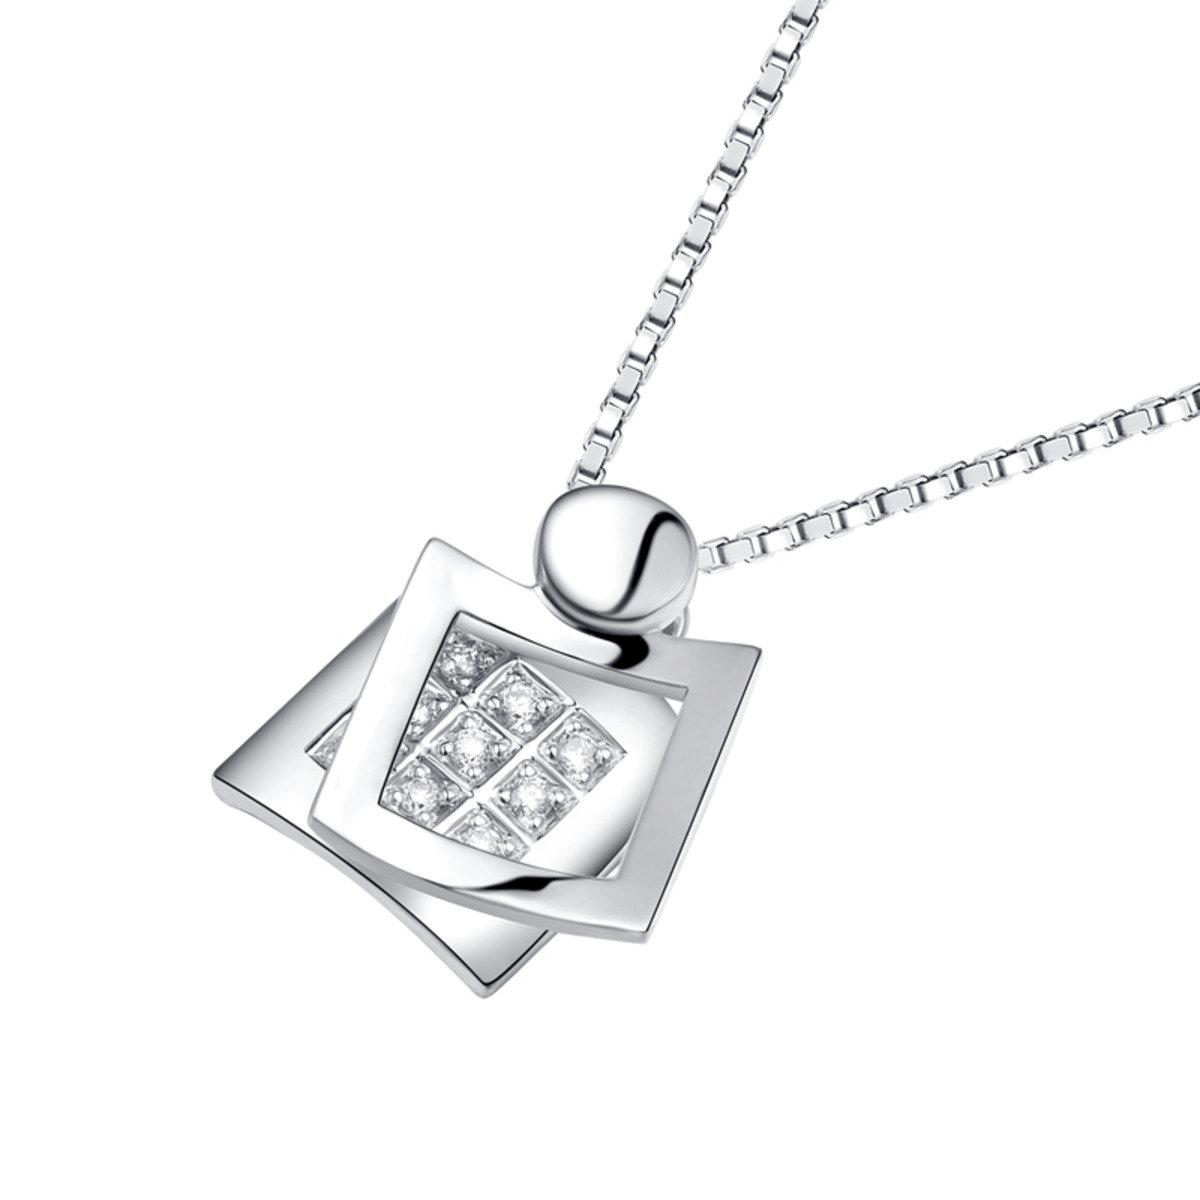 18K/750 白色黃金鑽石鑲嵌方形吊墜 (此吊墜不包括項鍊)